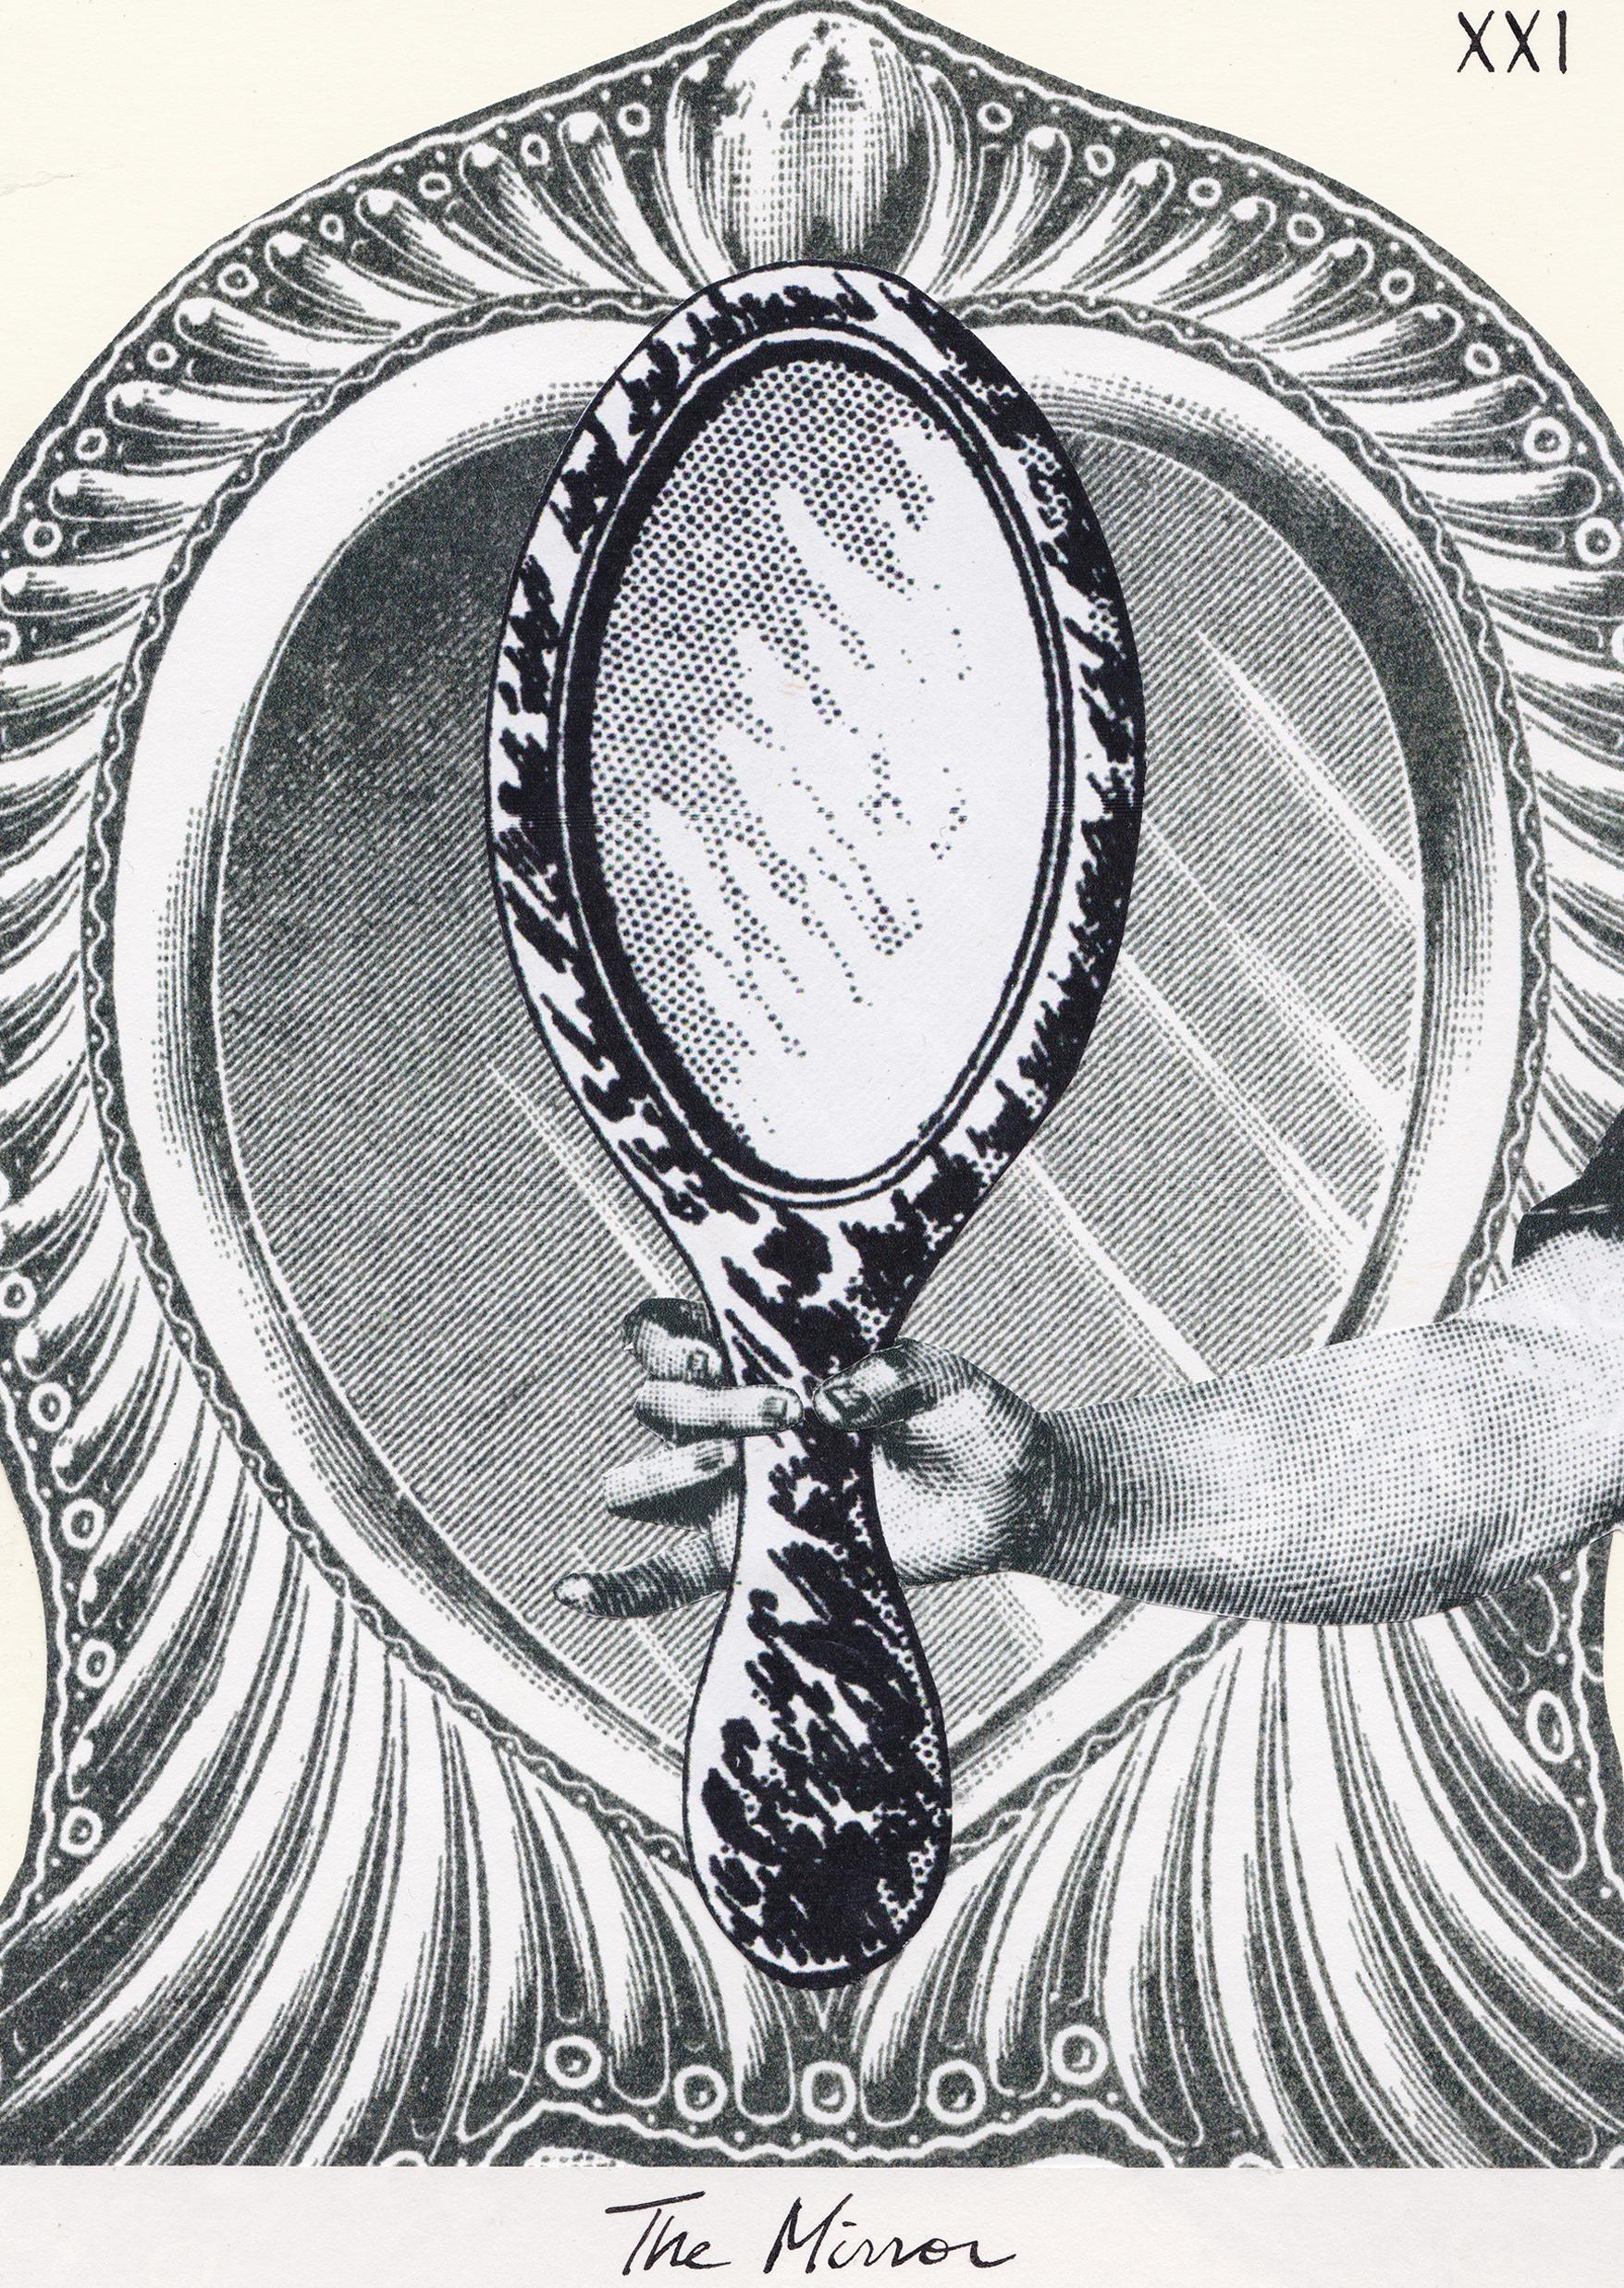 The Mirror, Collage Giclée print on Hahnemühle Photo Rag, 21x14.8cm